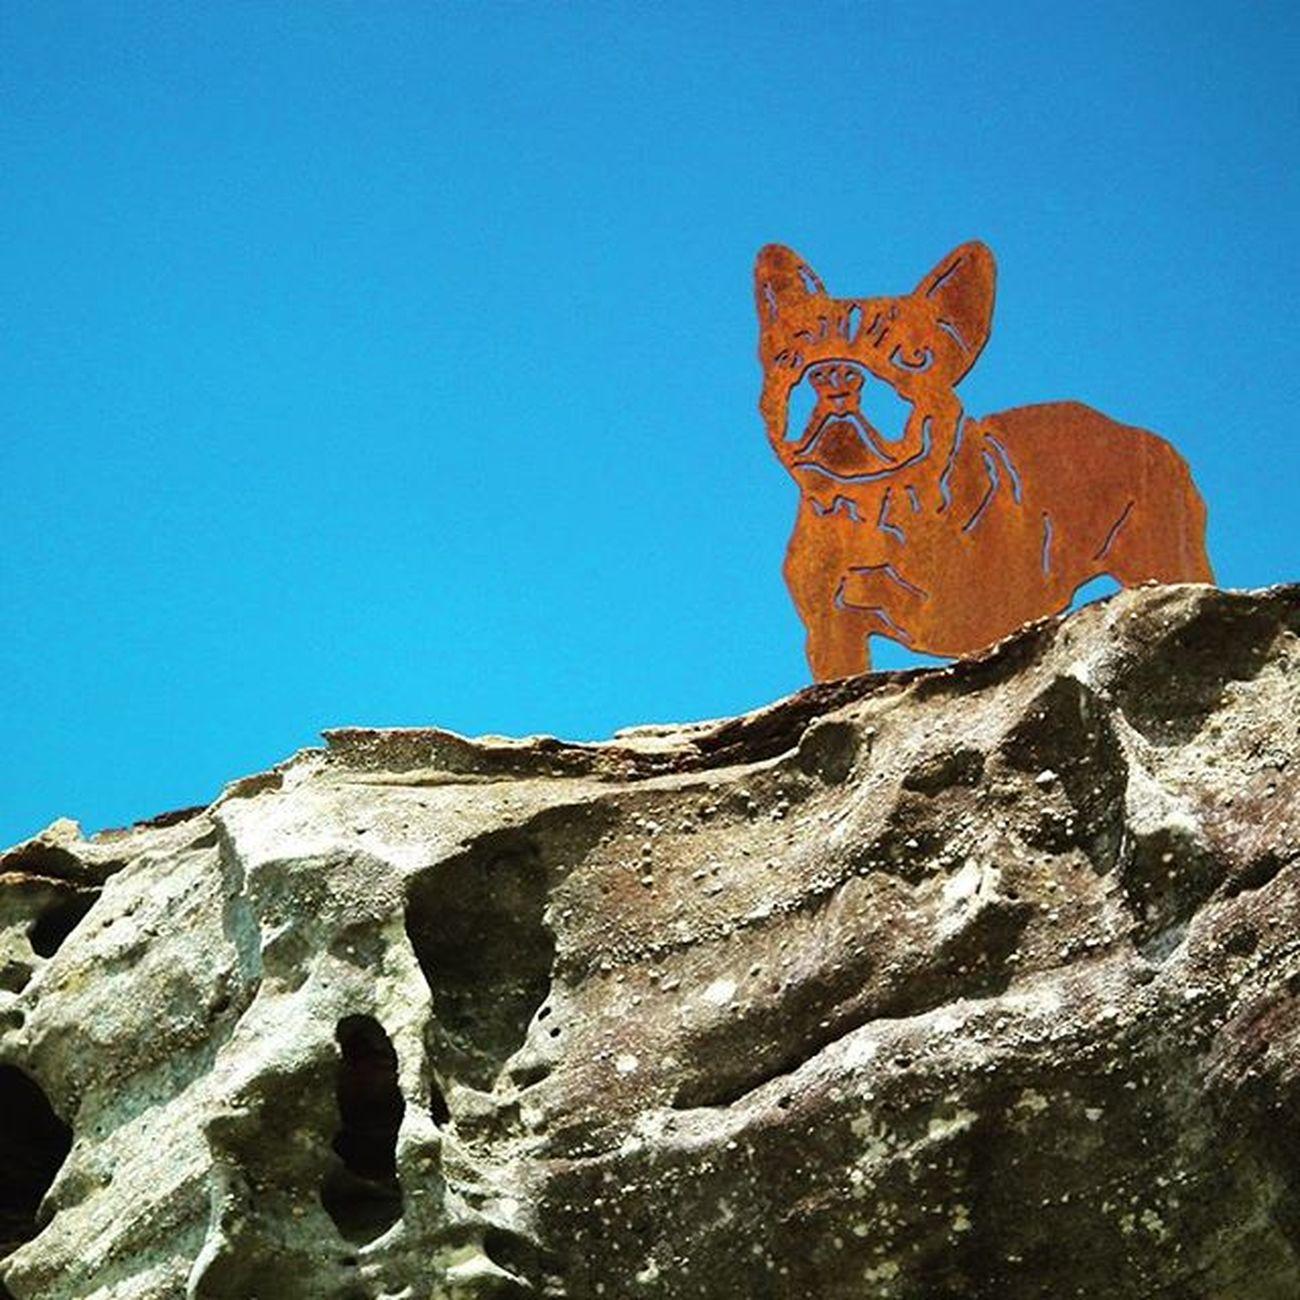 Bondi Bondibeach Rock Dogsofinstagram dog sculpturebythesea blue